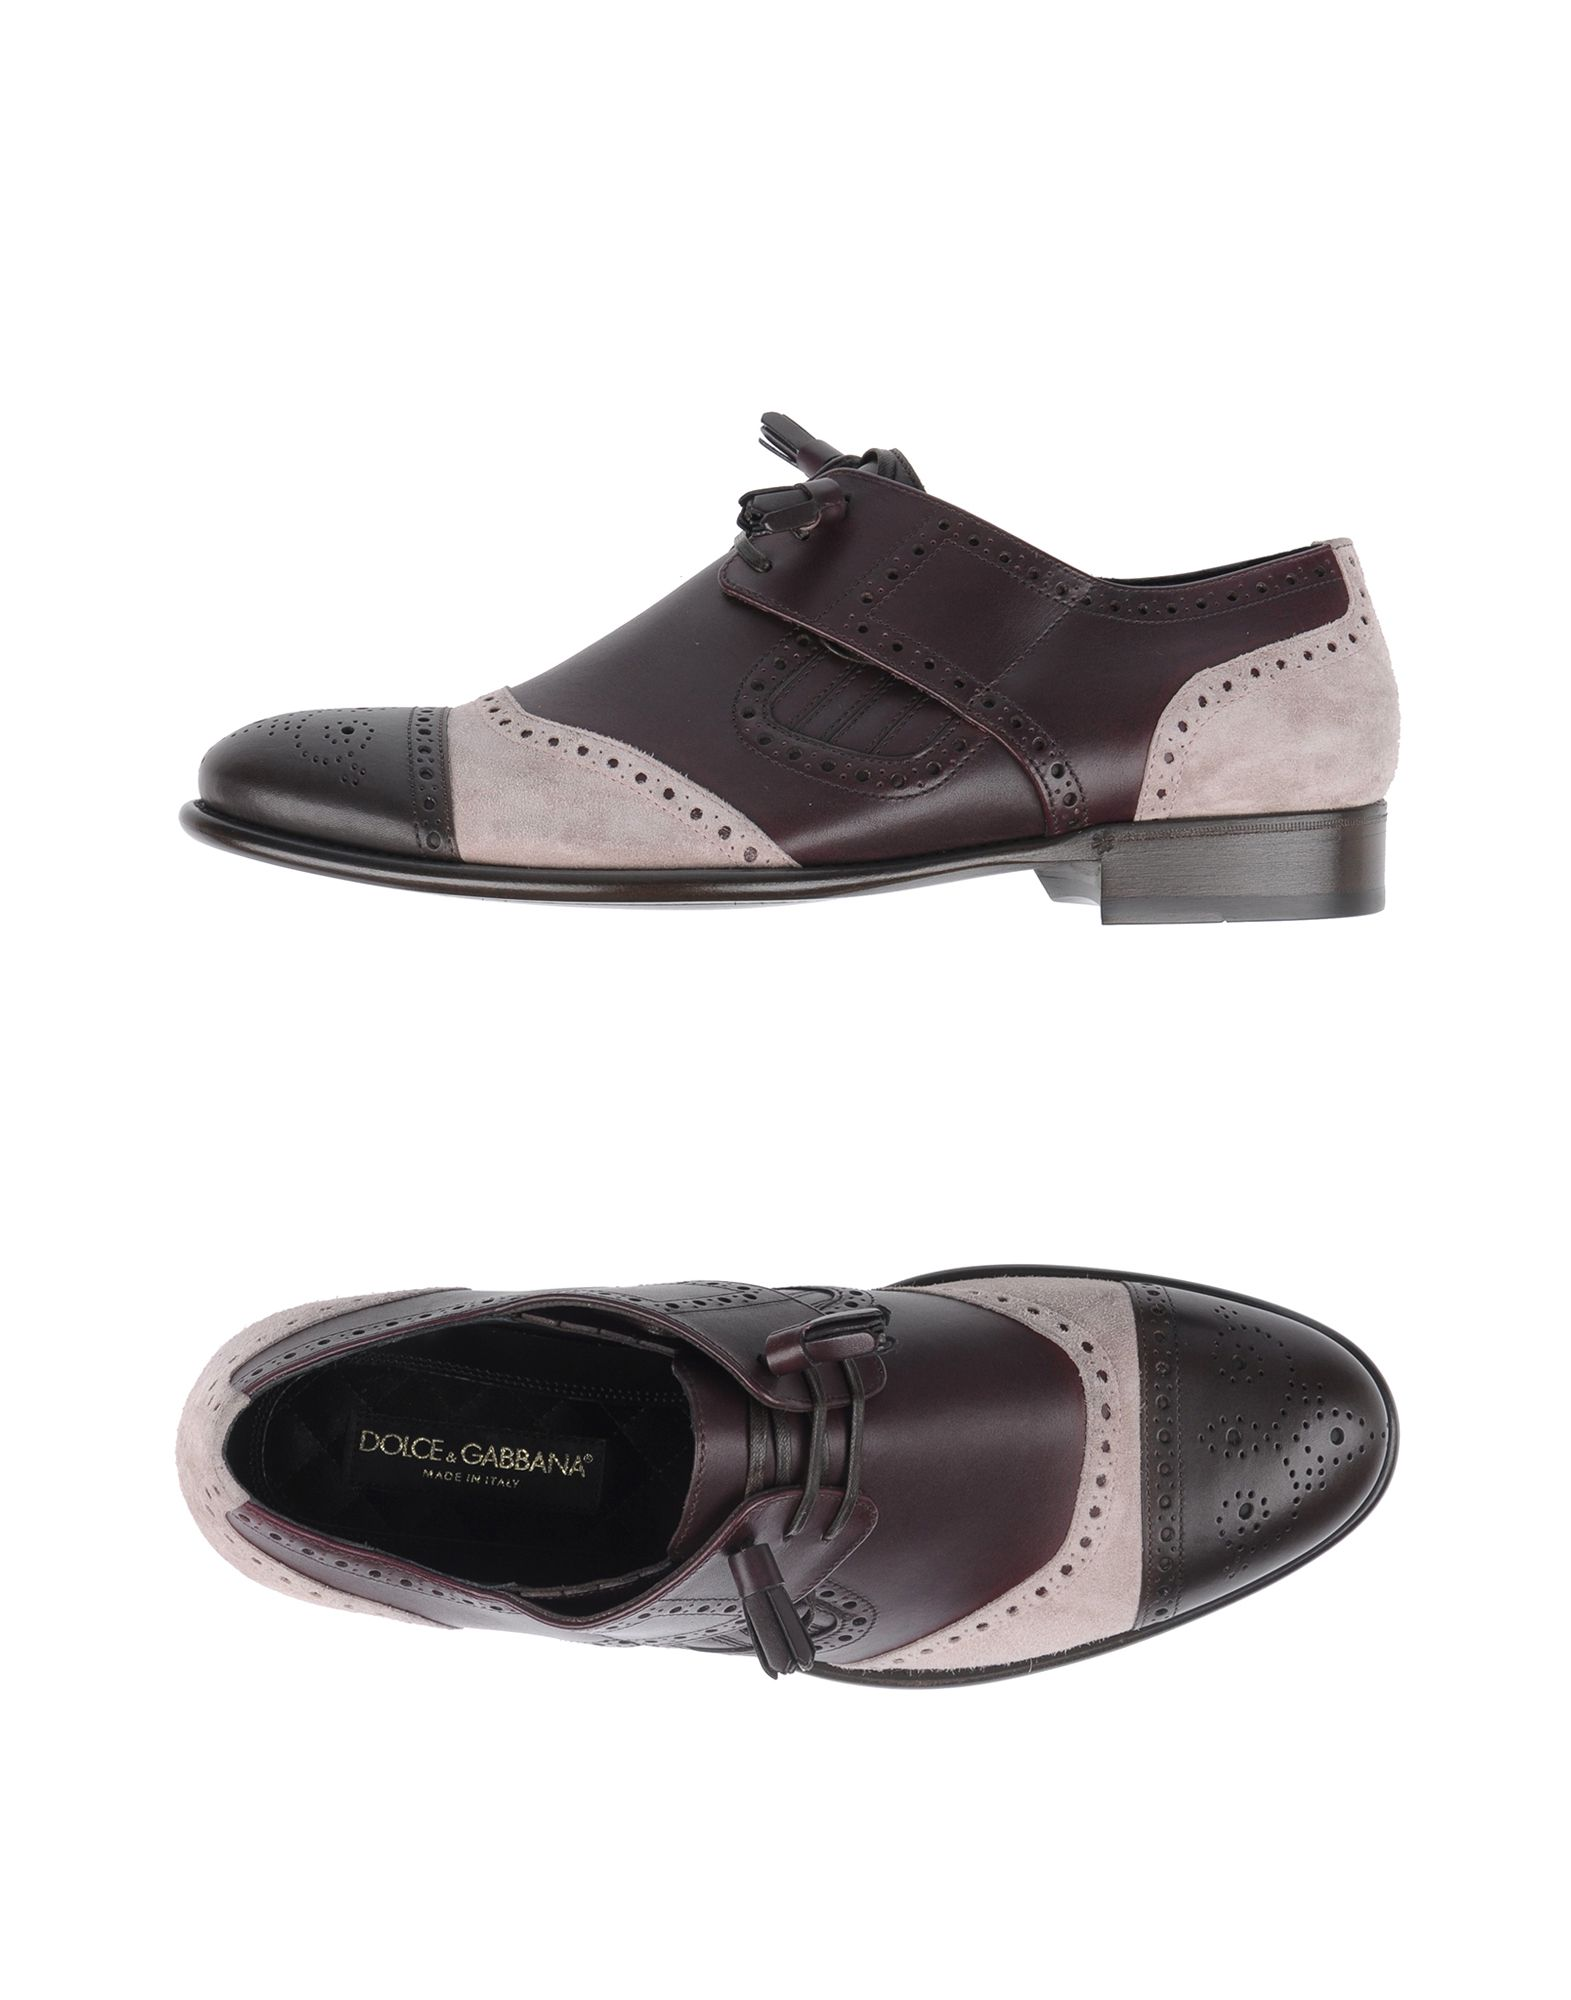 Dolce & Gabbana Gabbana & Schnürschuhe Herren  11158057RE Neue Schuhe 912cec